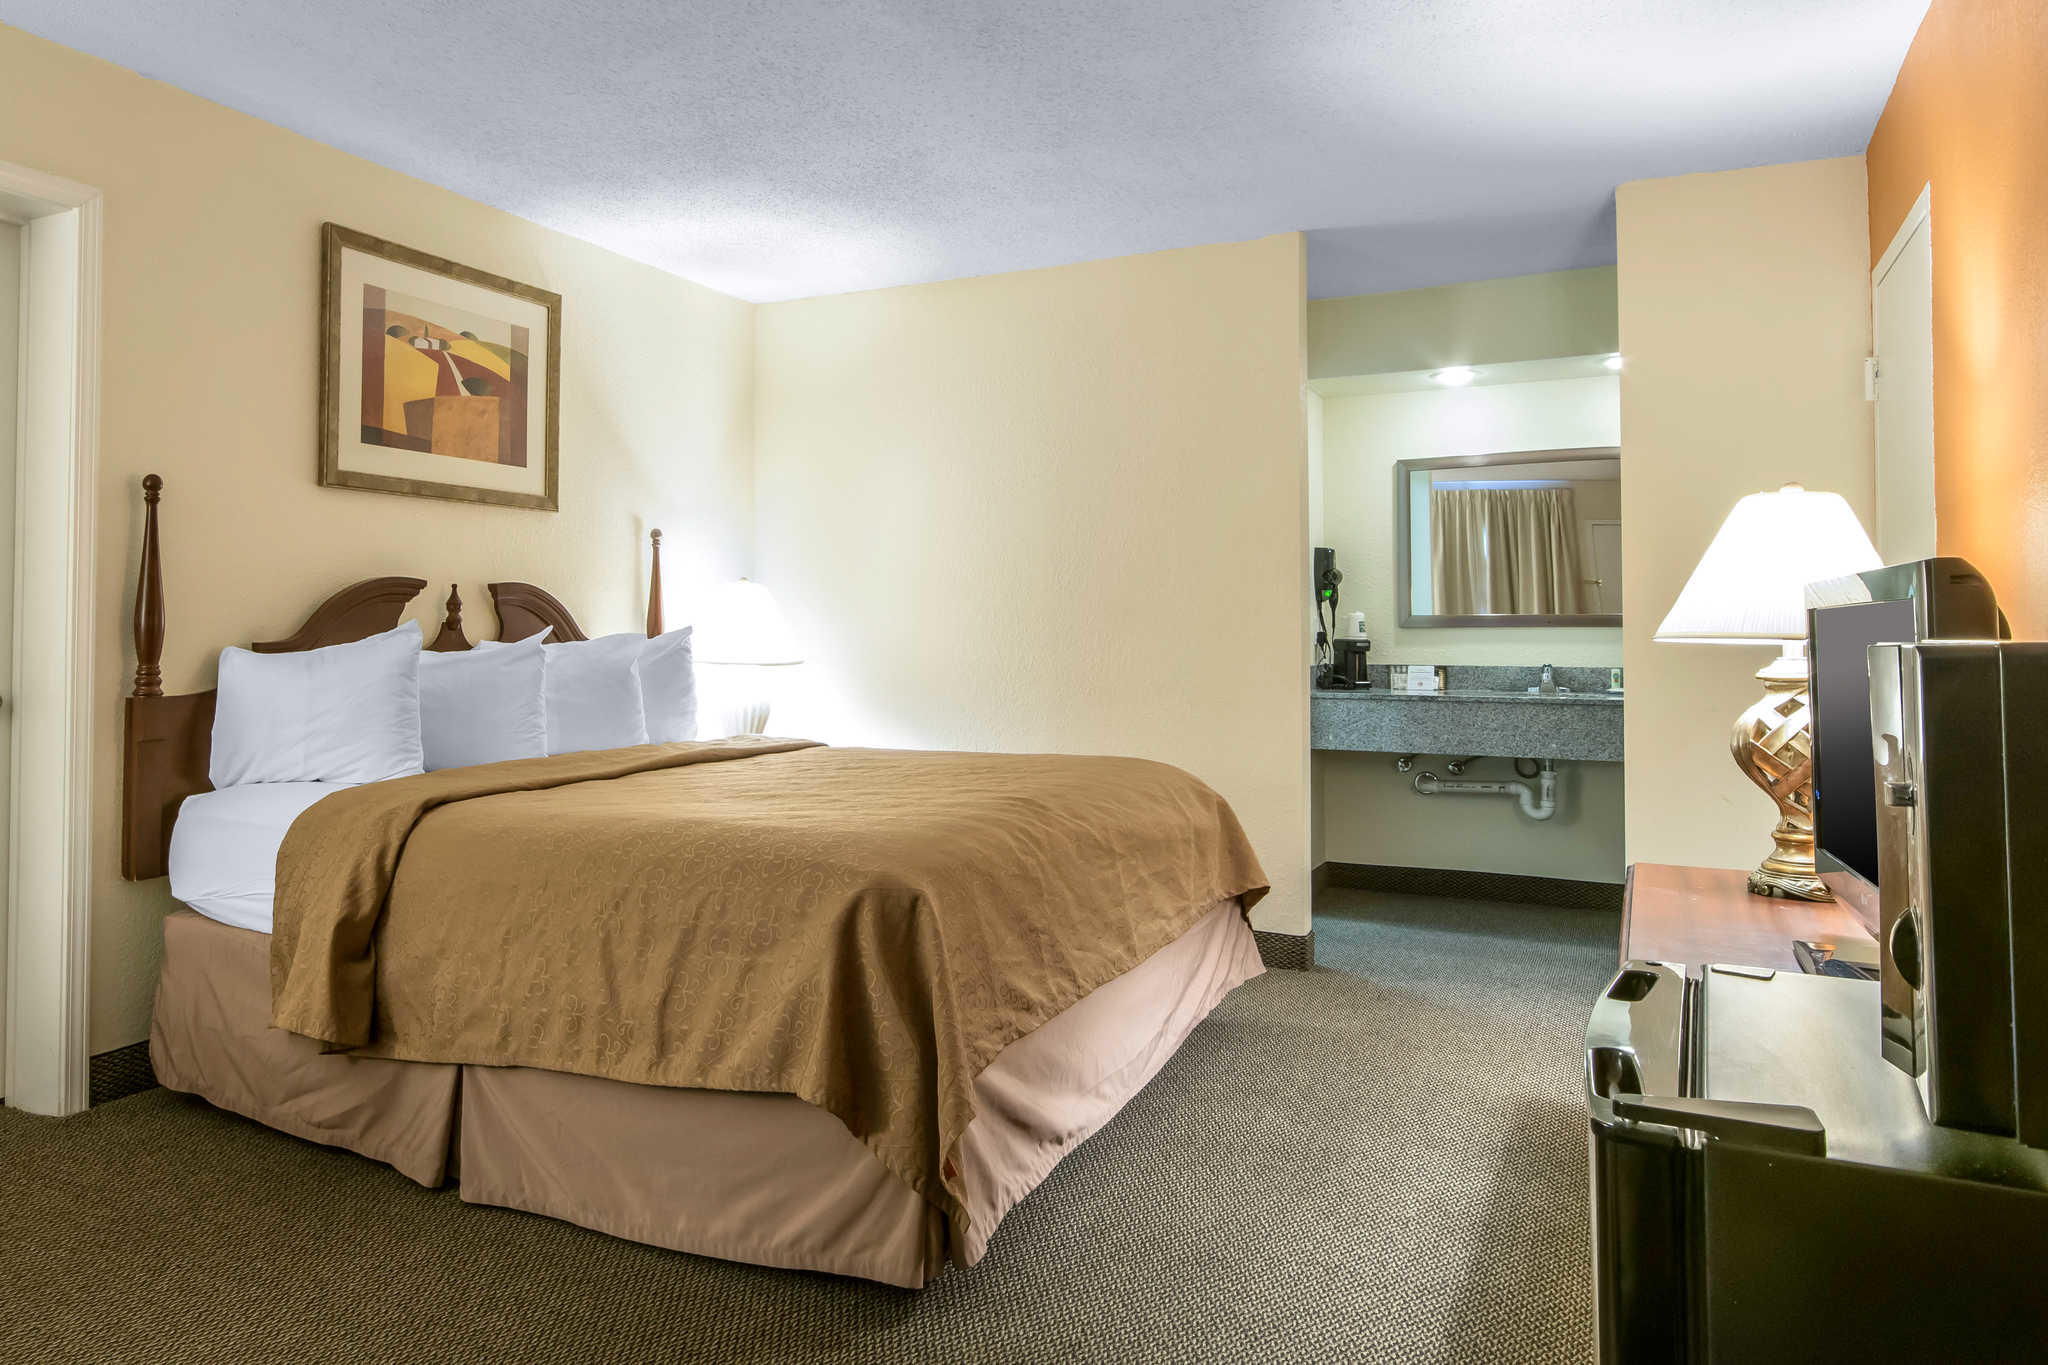 Quality Inn - Closed image 23